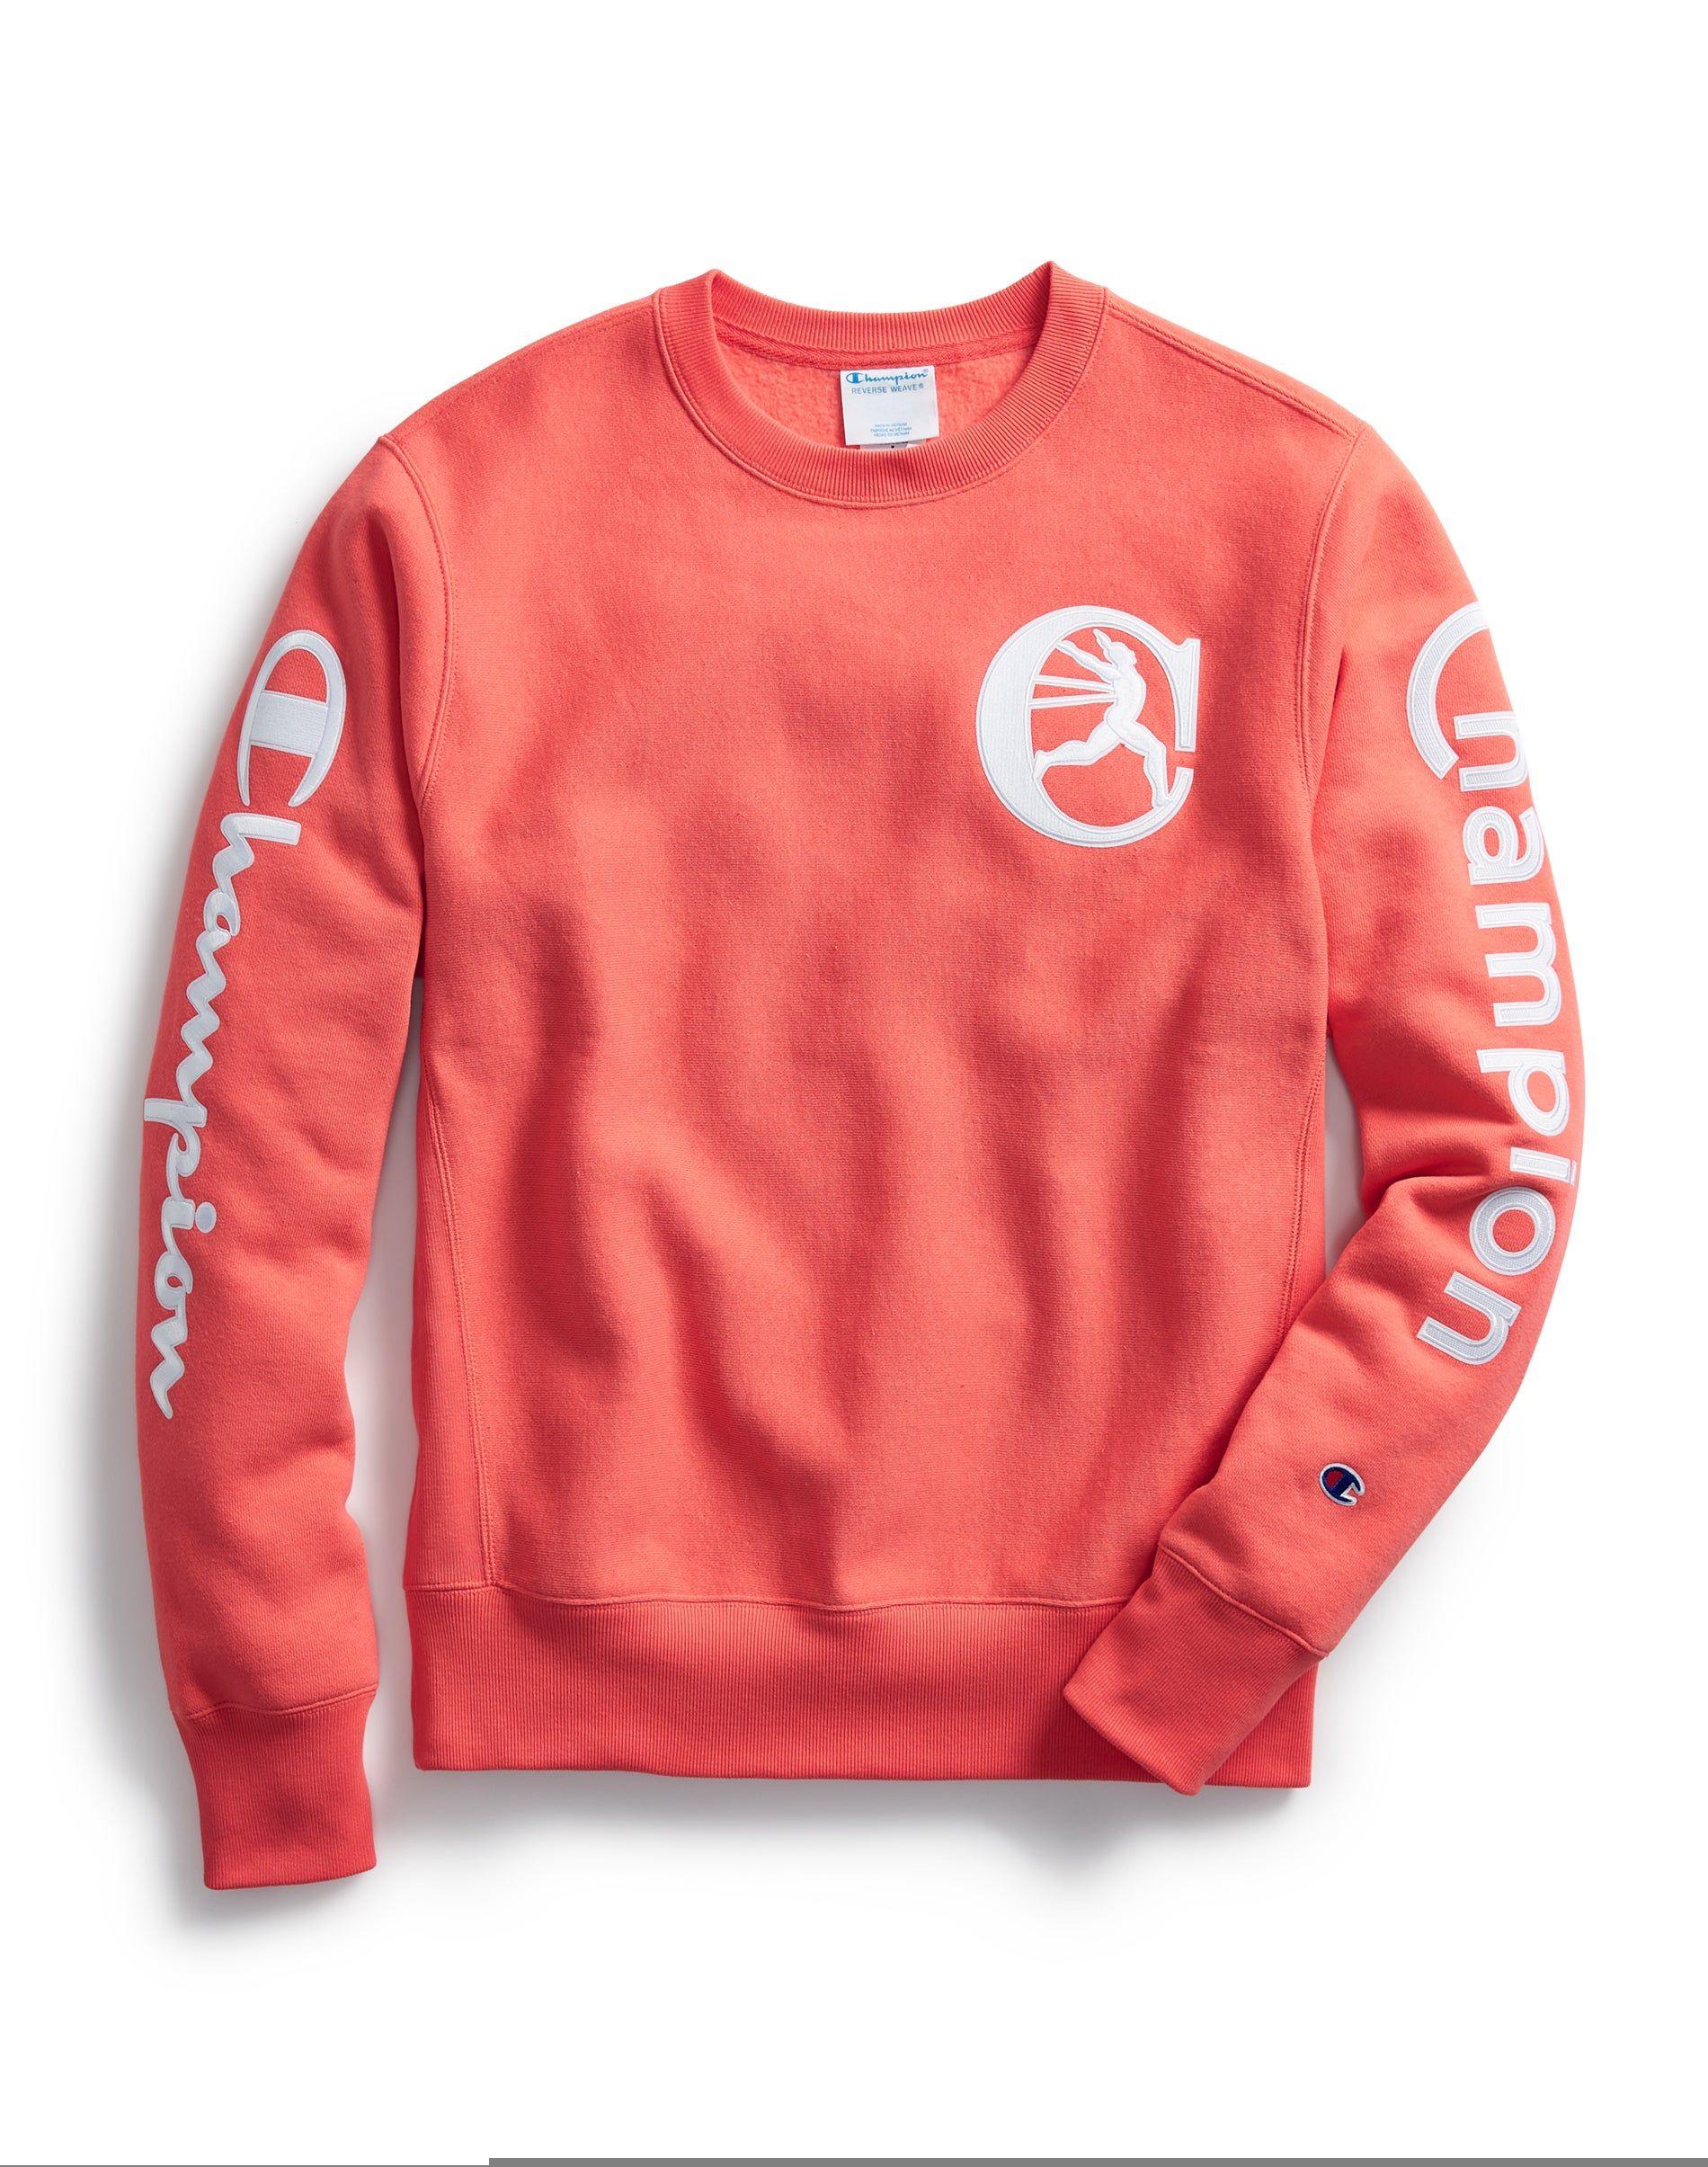 Men S Champion Life Exclusive Reverse Weave Crew Retro Logos Groovy Papaya Sweatshirts Mens Sweatshirts Hoodie Retro Logos [ 2410 x 1900 Pixel ]